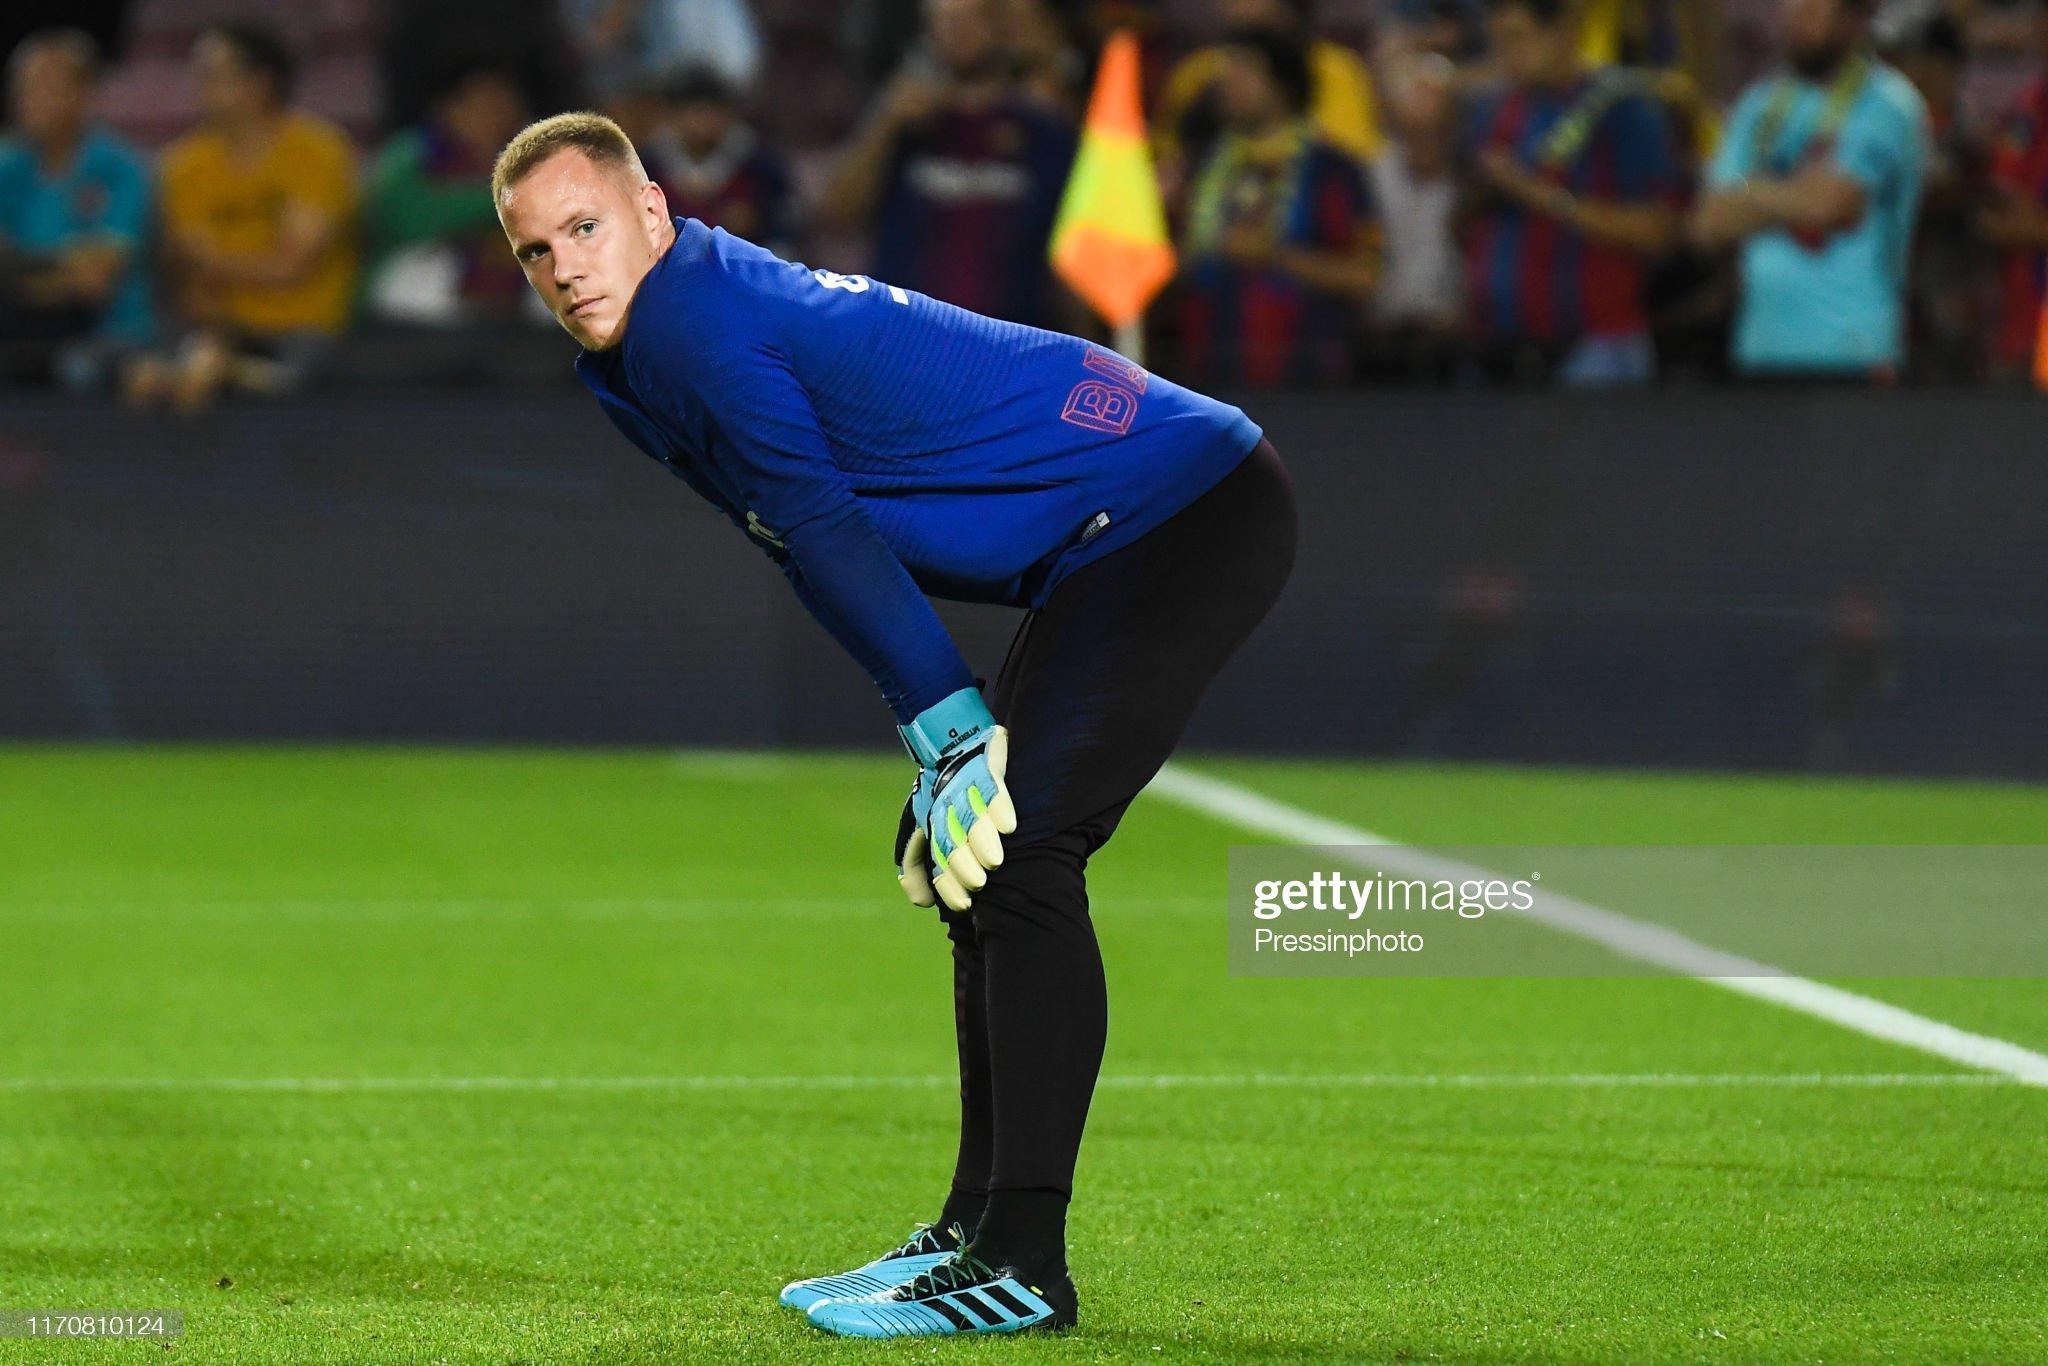 صور مباراة : برشلونة - فياريال 2-1 ( 24-09-2019 )  Marcandre-ter-stegen-of-fc-barcelona-during-the-liga-match-between-picture-id1170810124?s=2048x2048